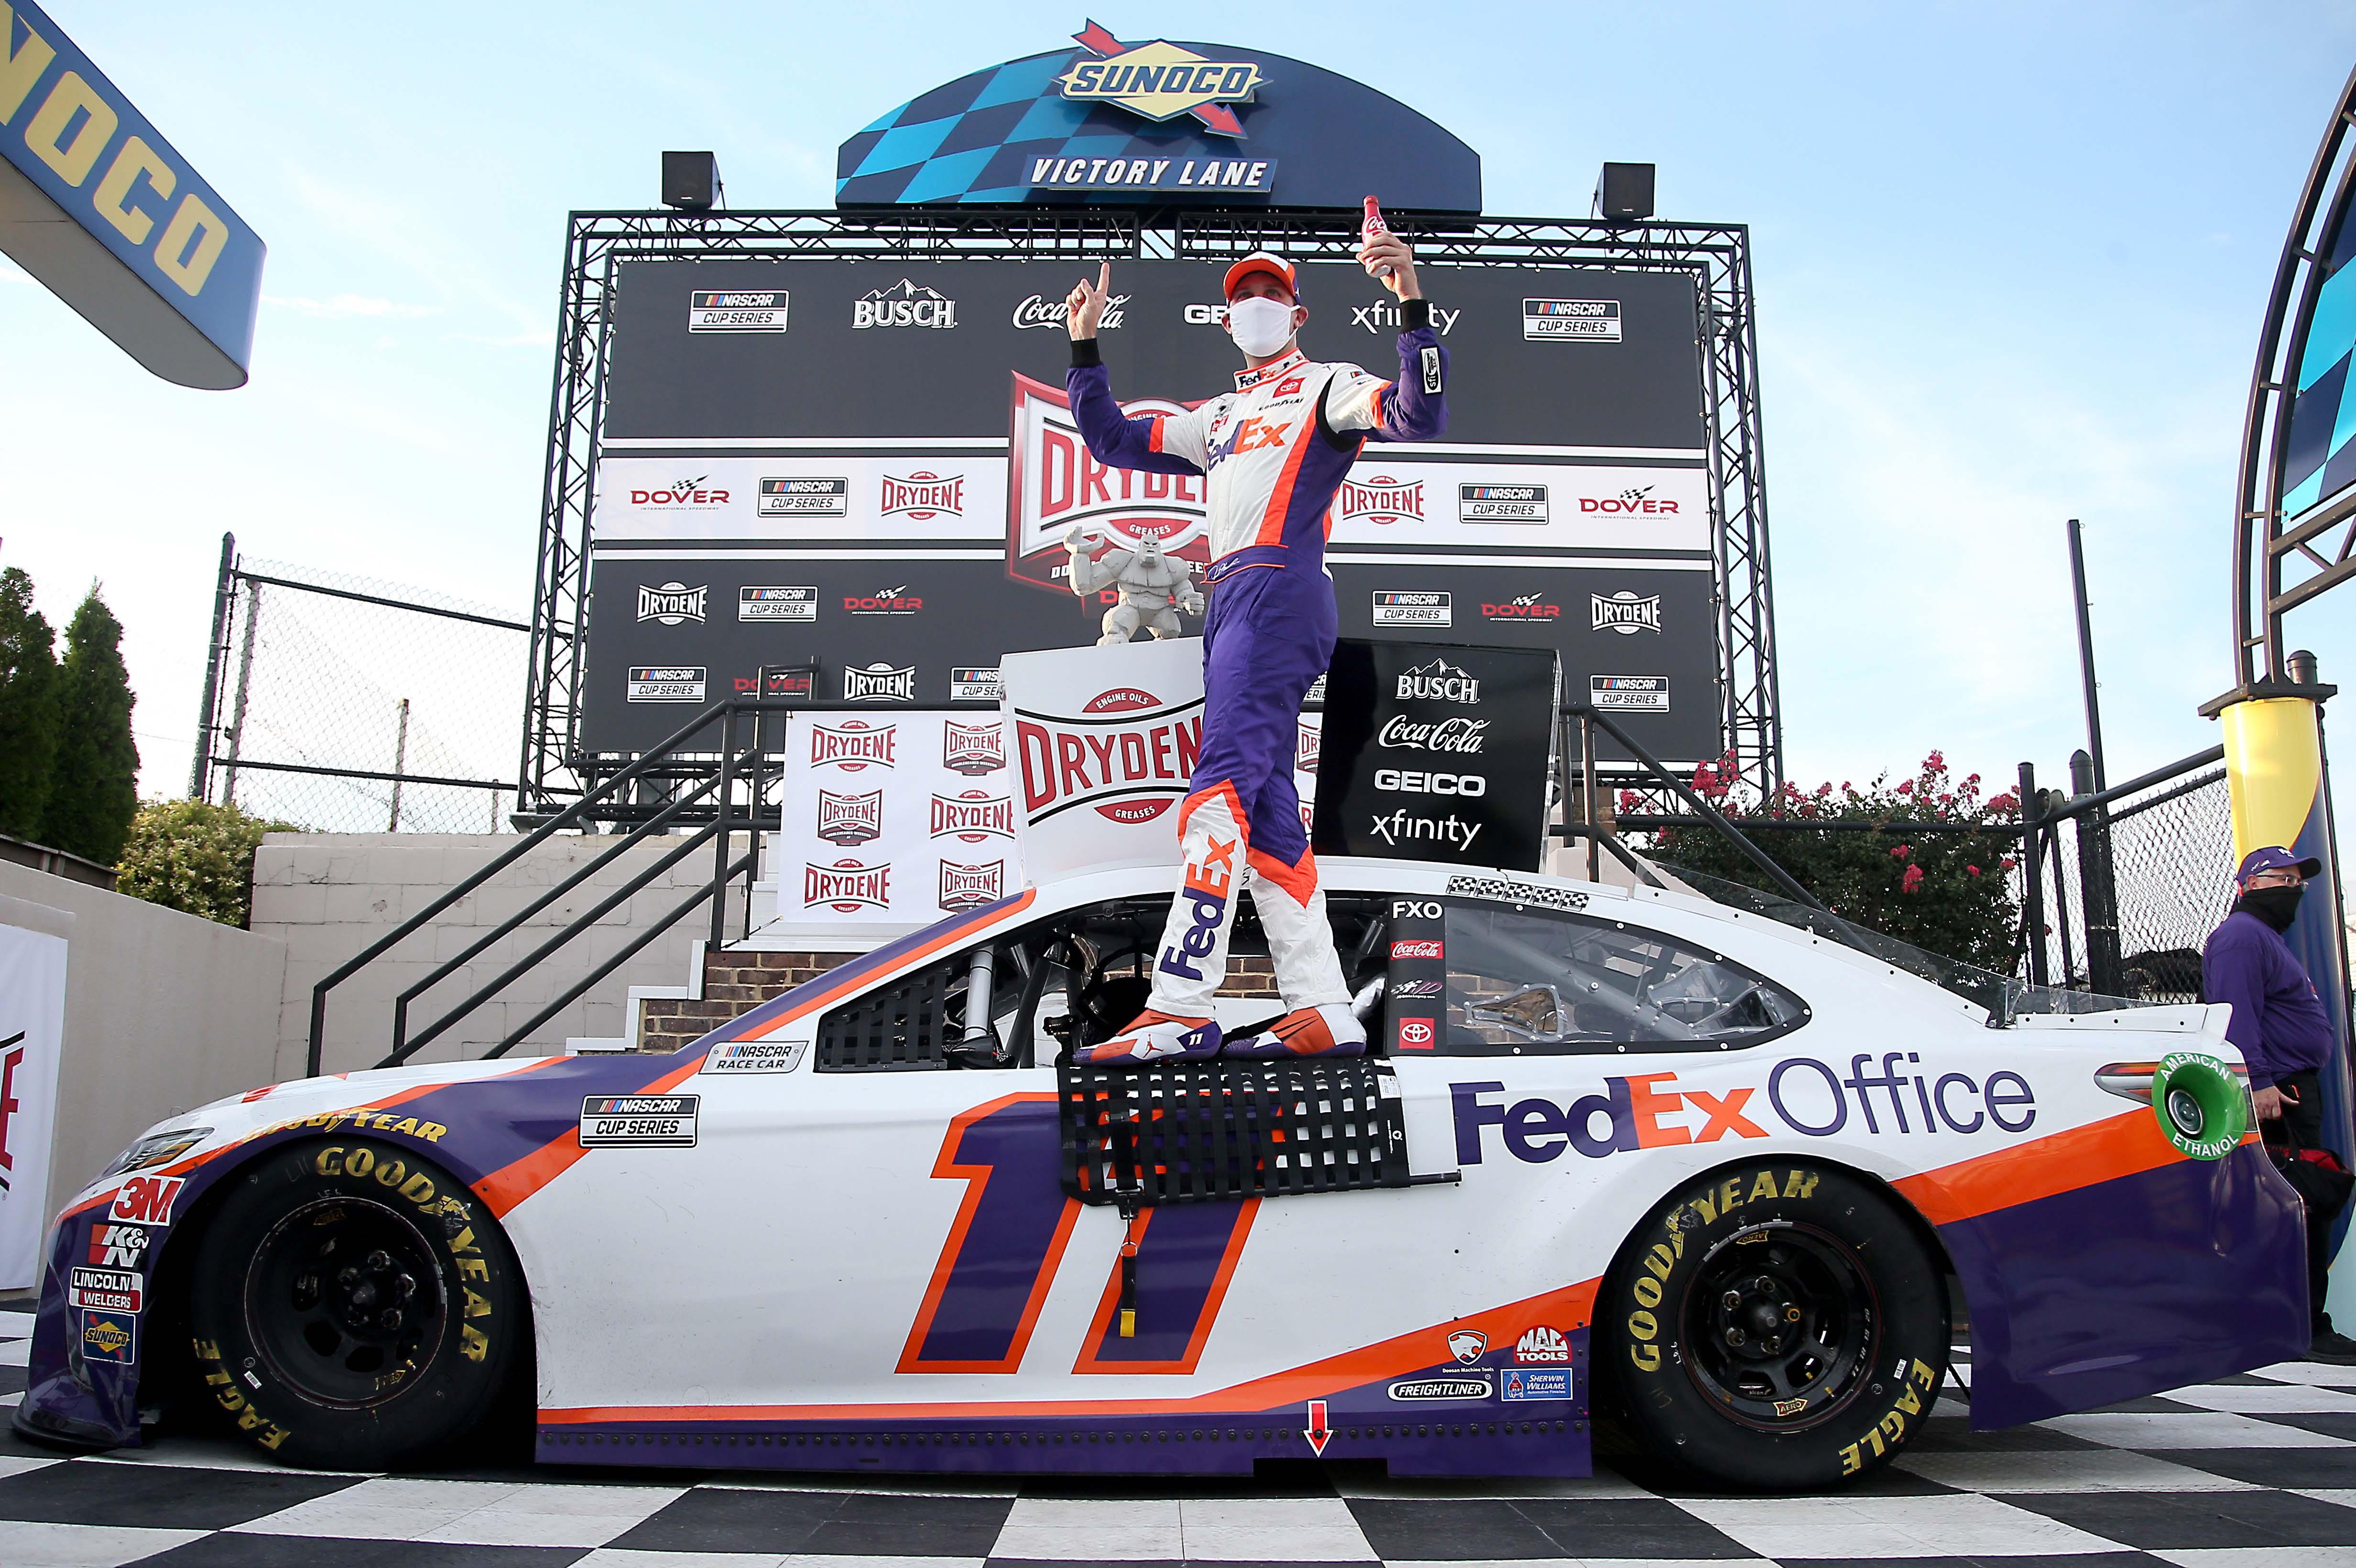 Denny Hamlin in victory lane - Dover International Speedway - NASCAR Cup Series